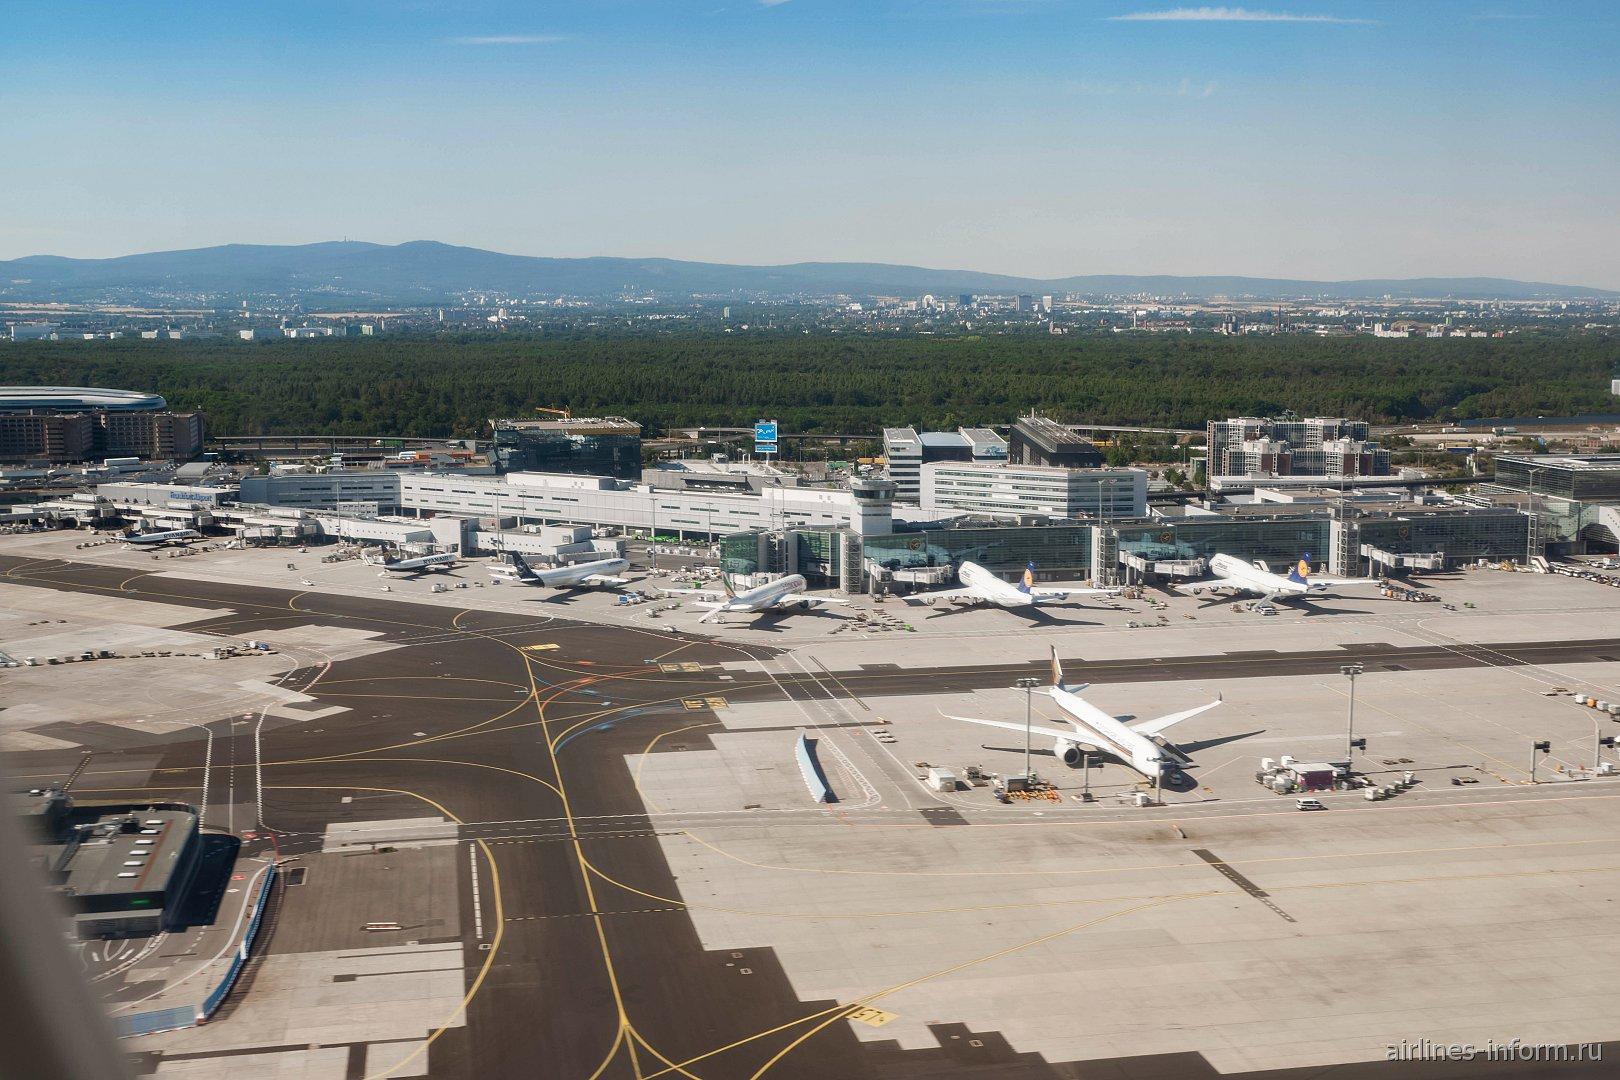 Вид при взлете на пирс C терминала 1 аэропорта Франкфурт